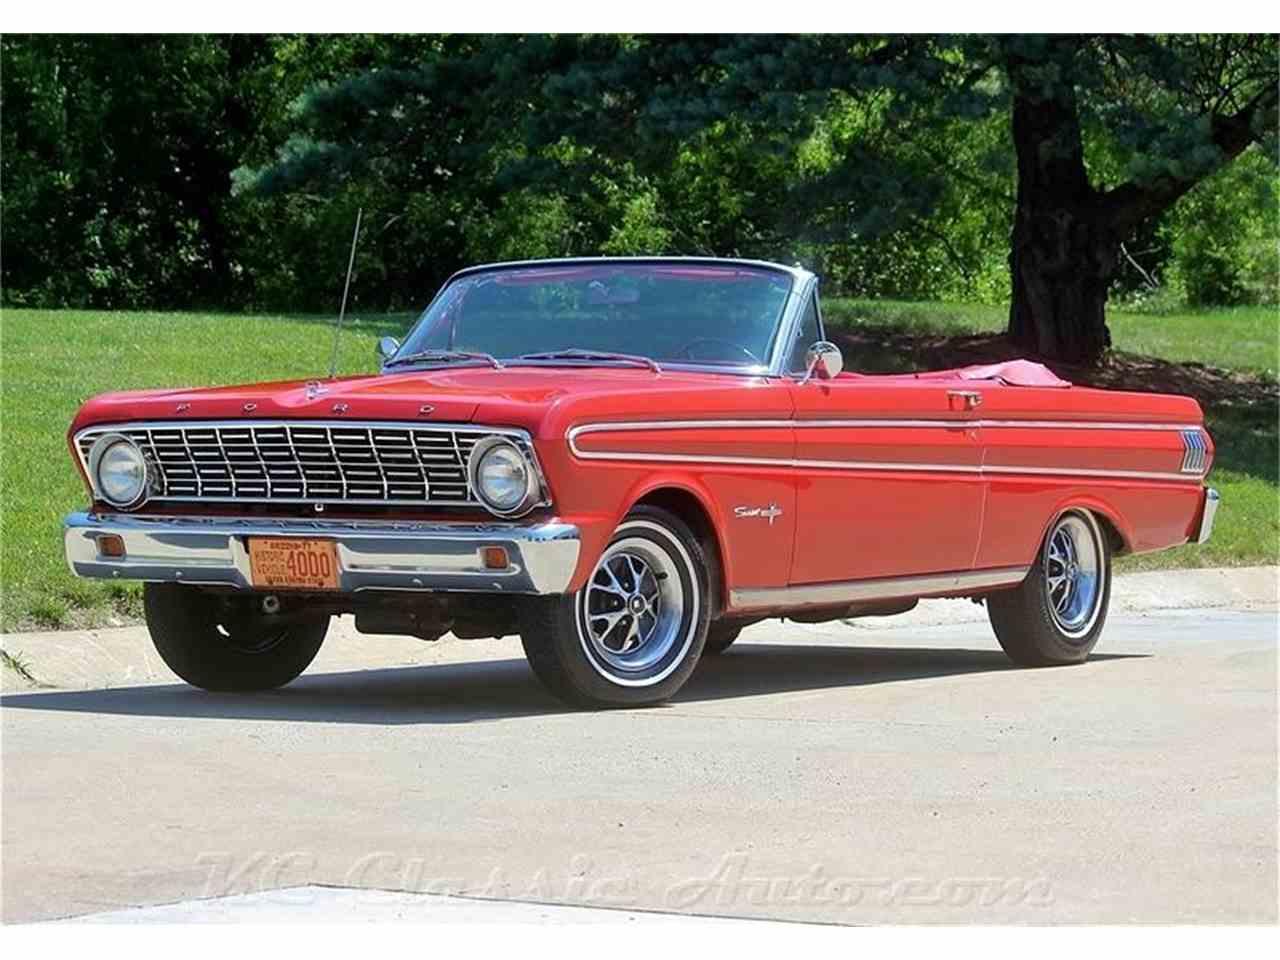 1964 Ford Falcon for Sale | ClassicCars.com | CC-1004748